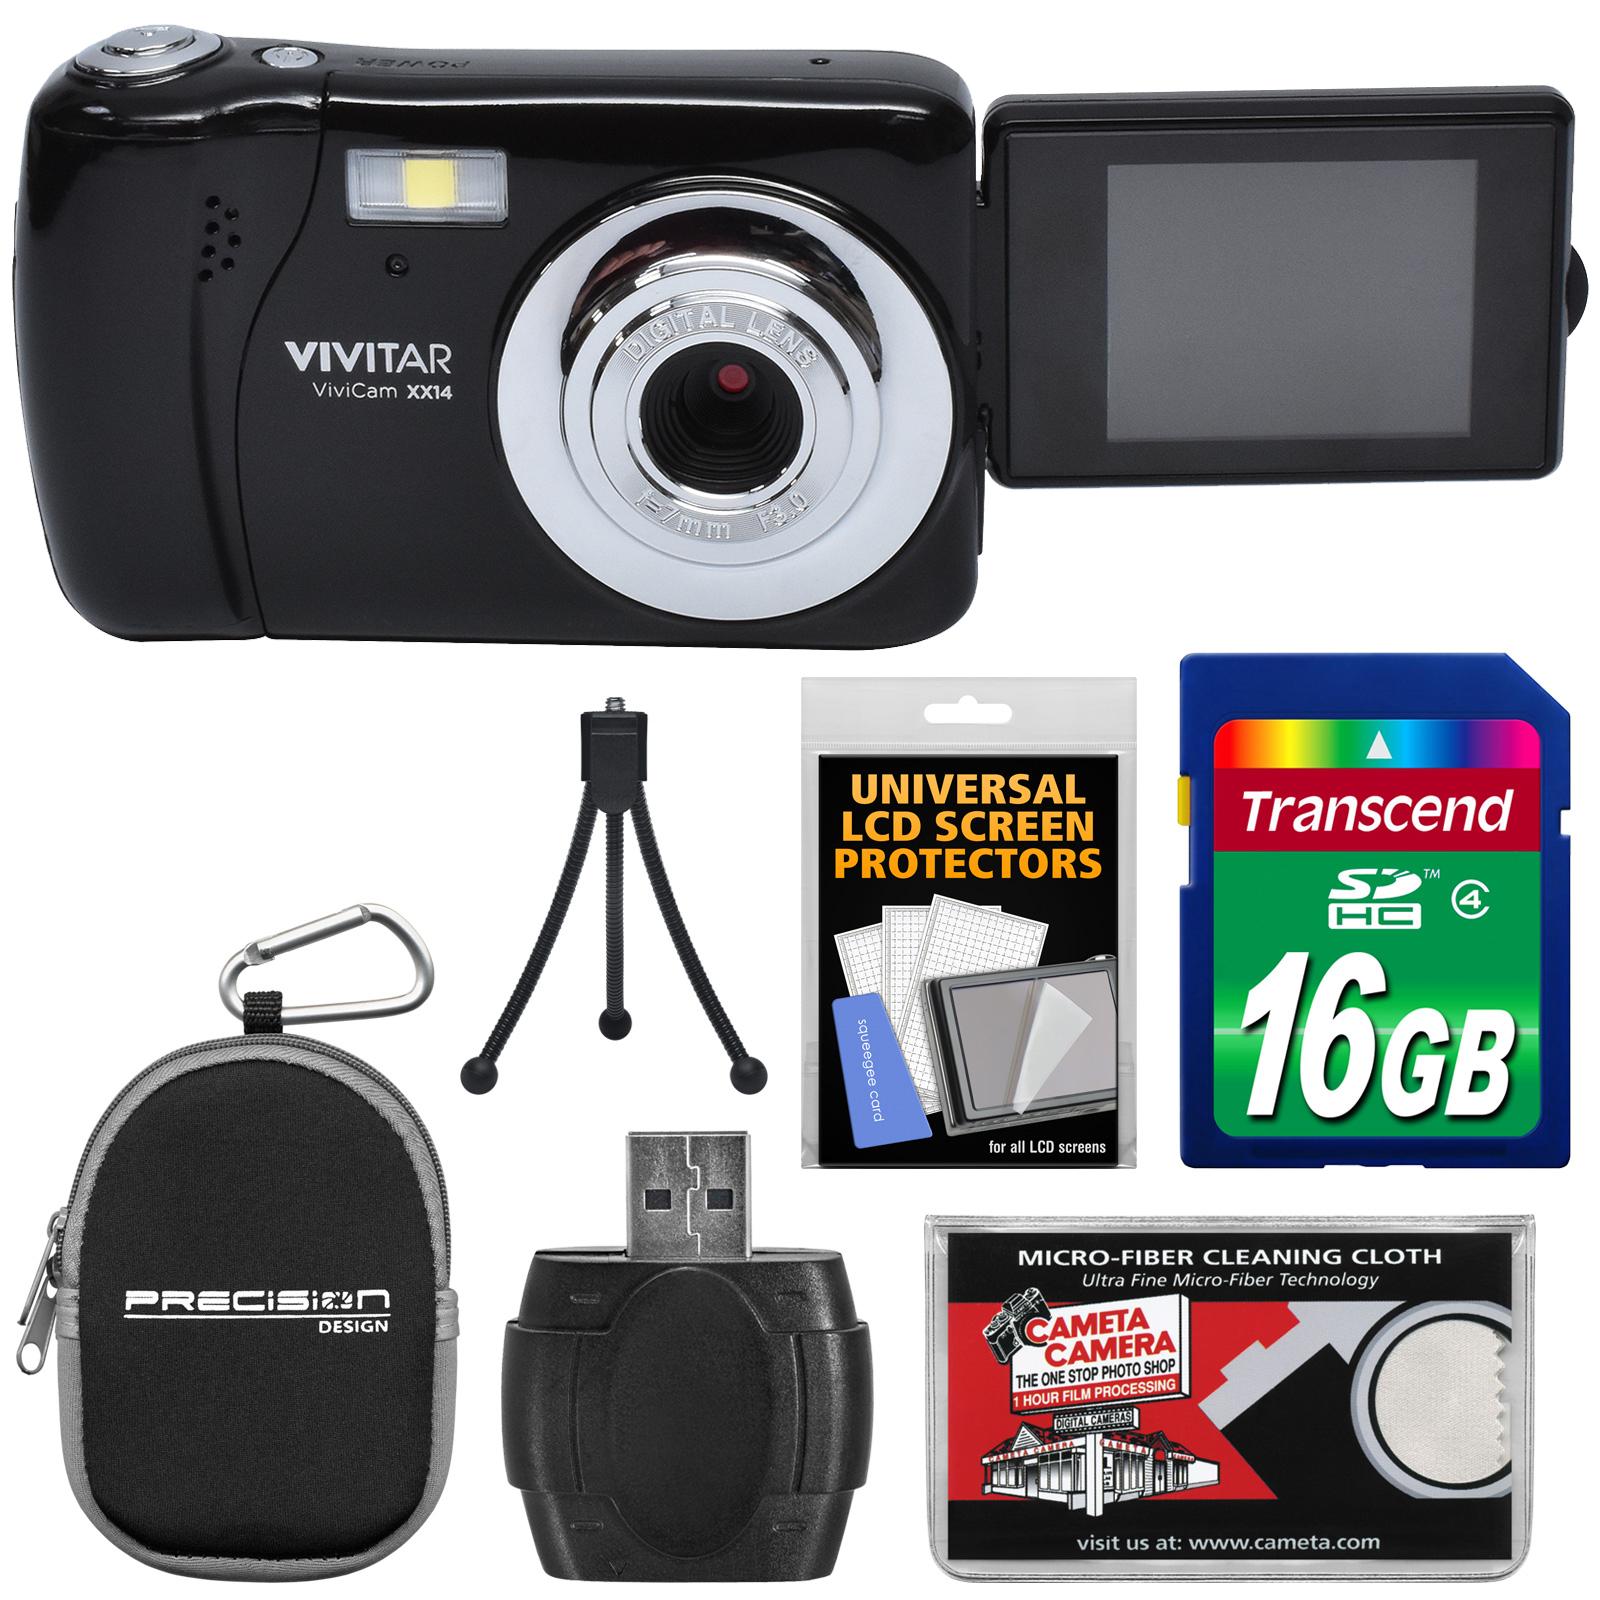 Vivitar ViviCam VXX14 Selfie Digital Camera (Black) with 16GB Card + Case + Tripod + Reader + Kit